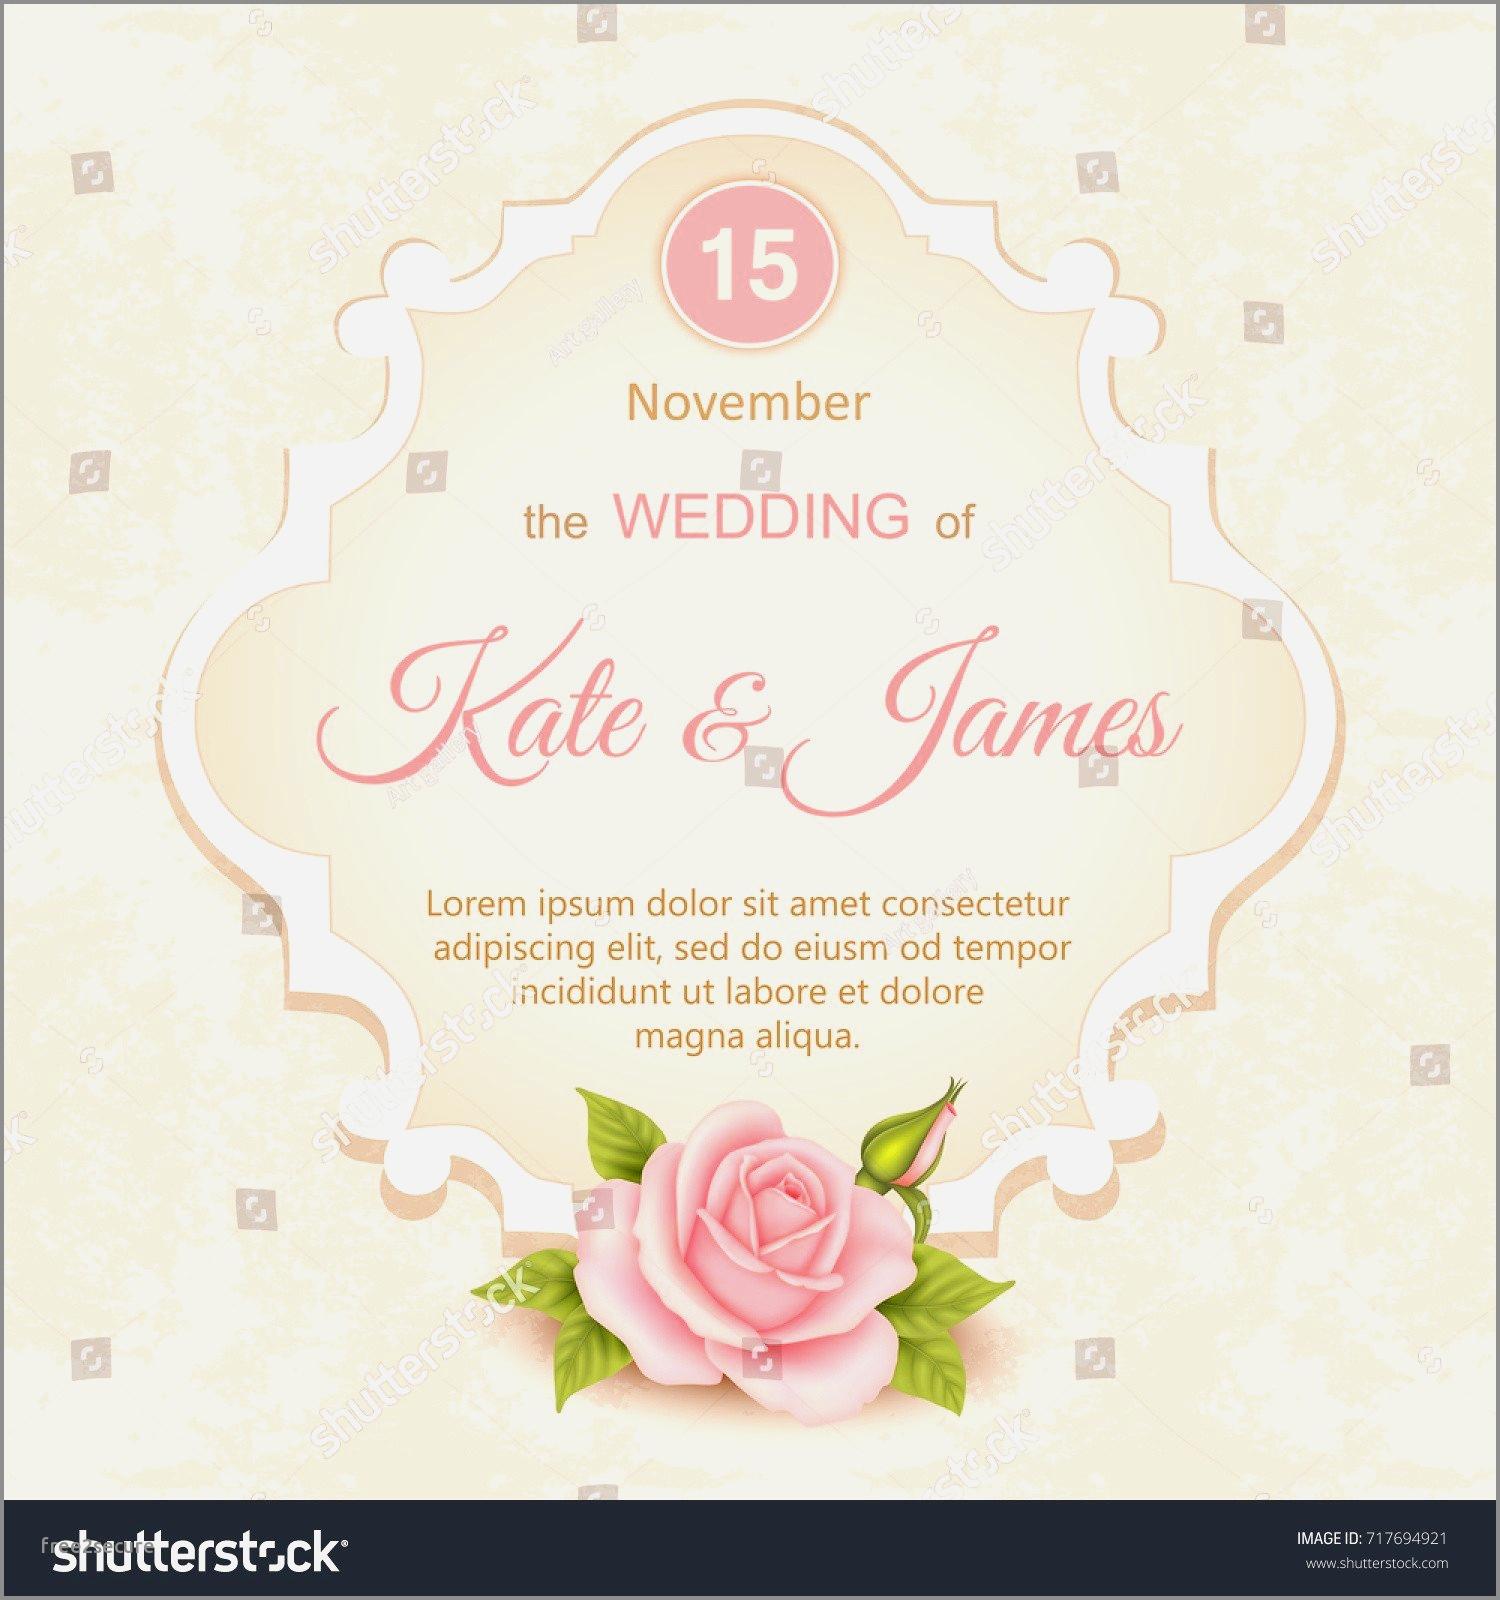 Evite Wedding Invitations Wedding Invitation Wording Evite Beautiful Awesome Samples Wedding